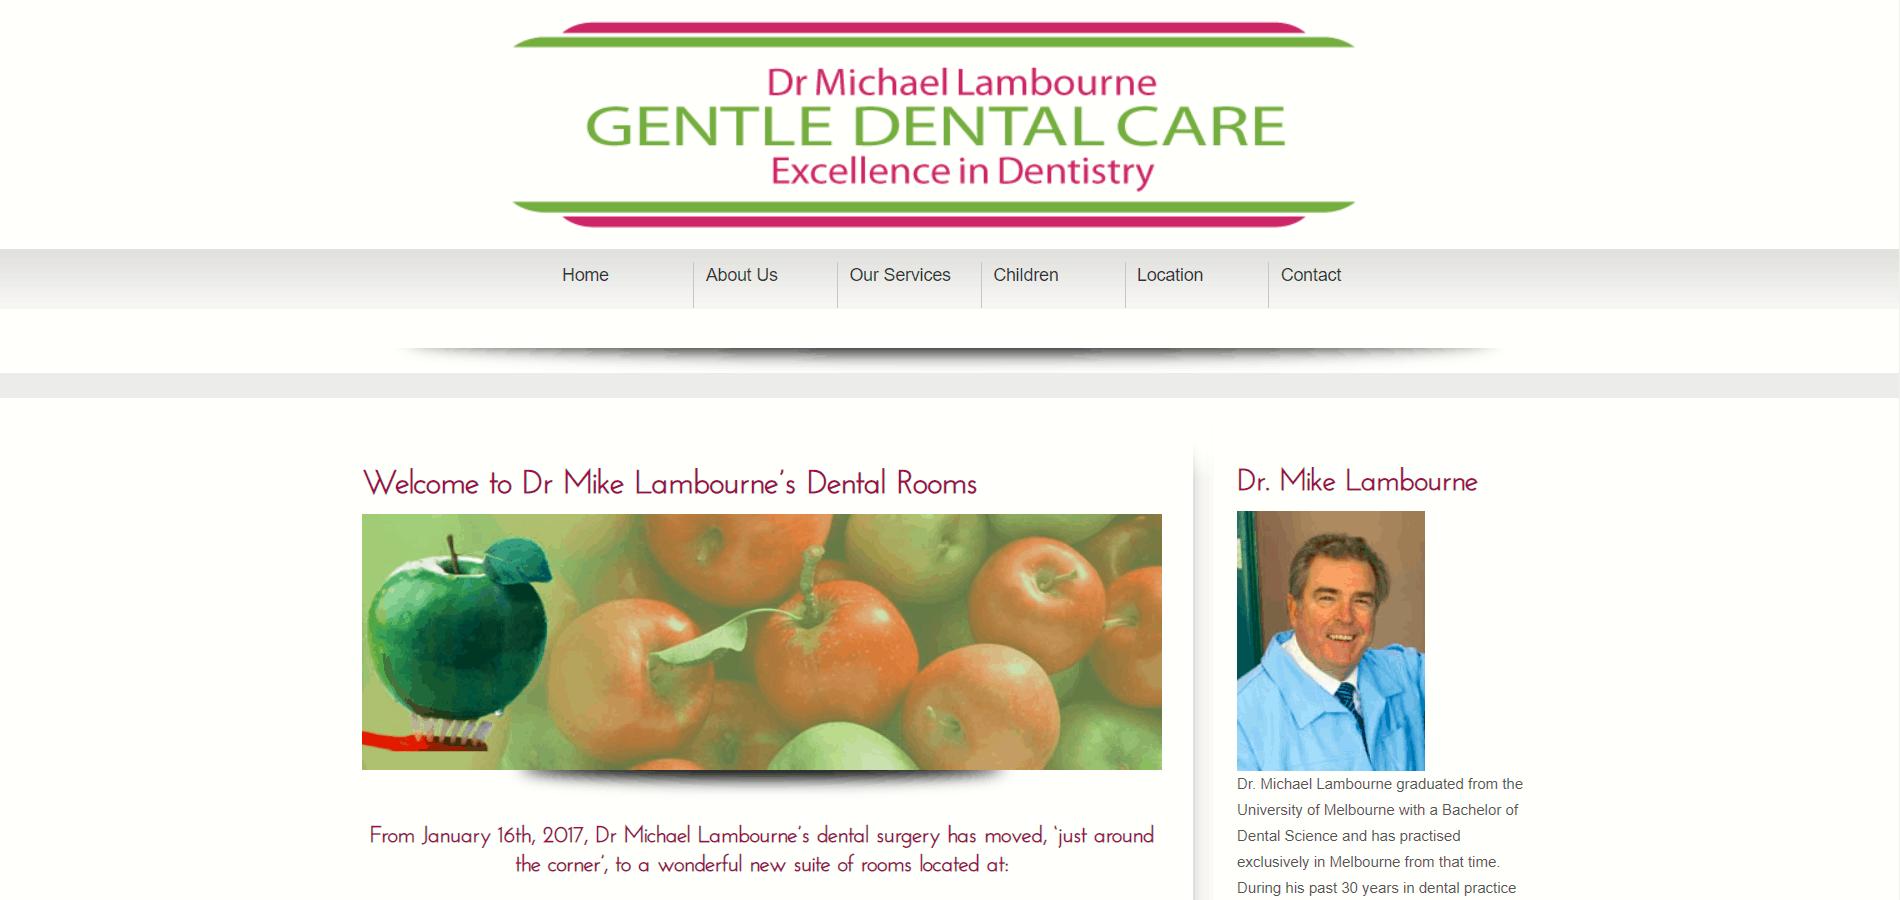 Dr Mike Lambourne's Dental